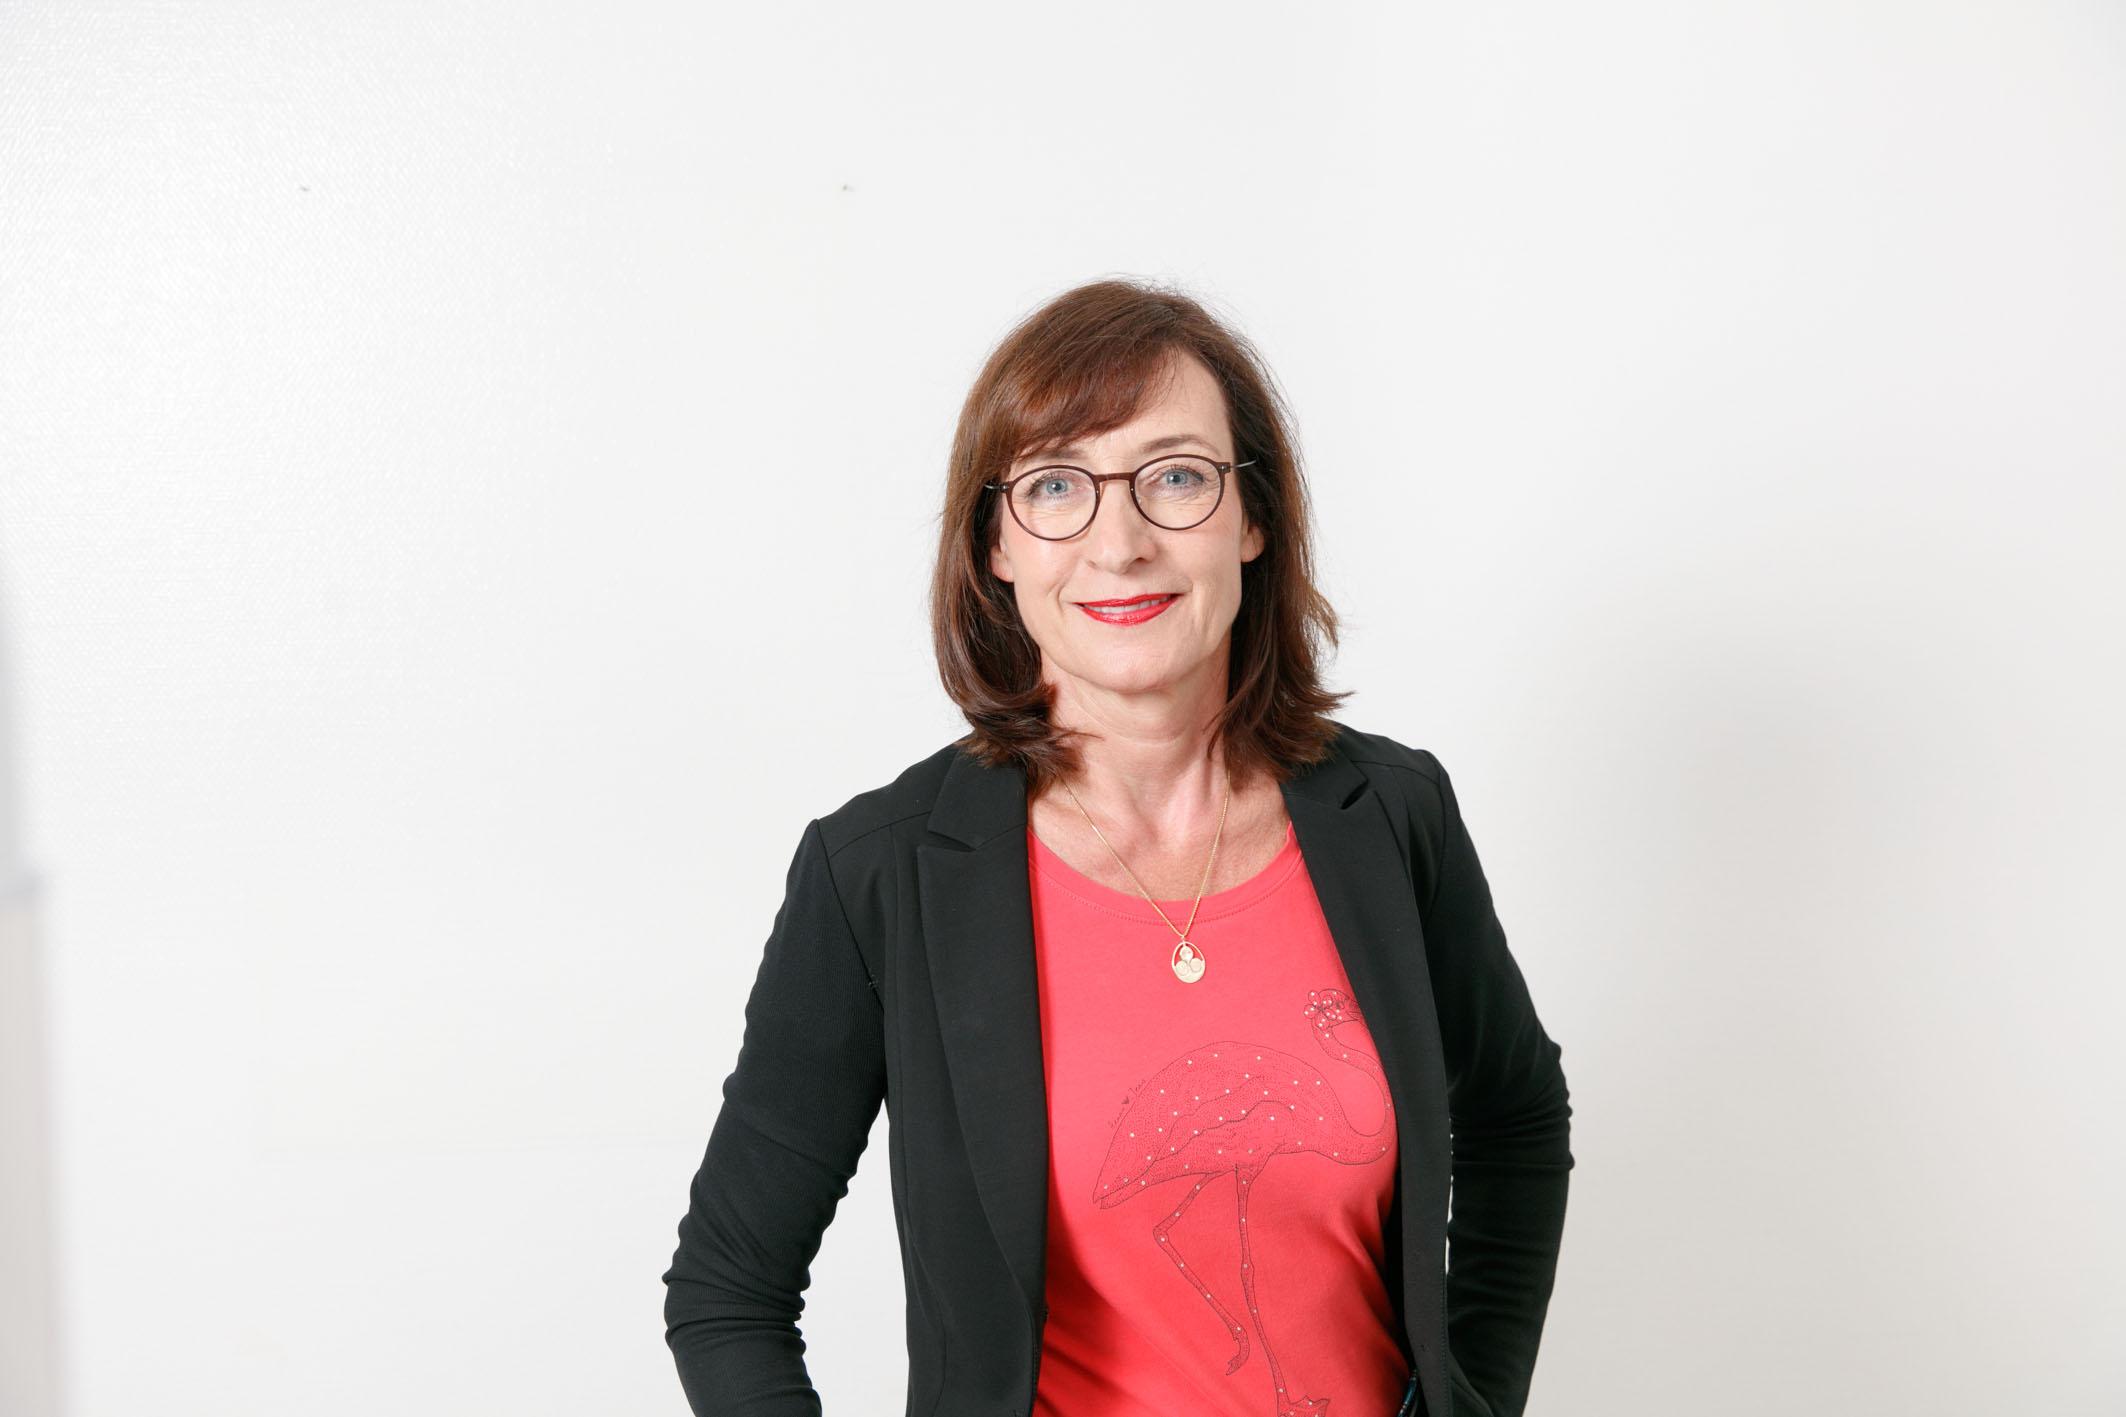 Zahnarzt in Aachen | Dr. Sabine Köhler